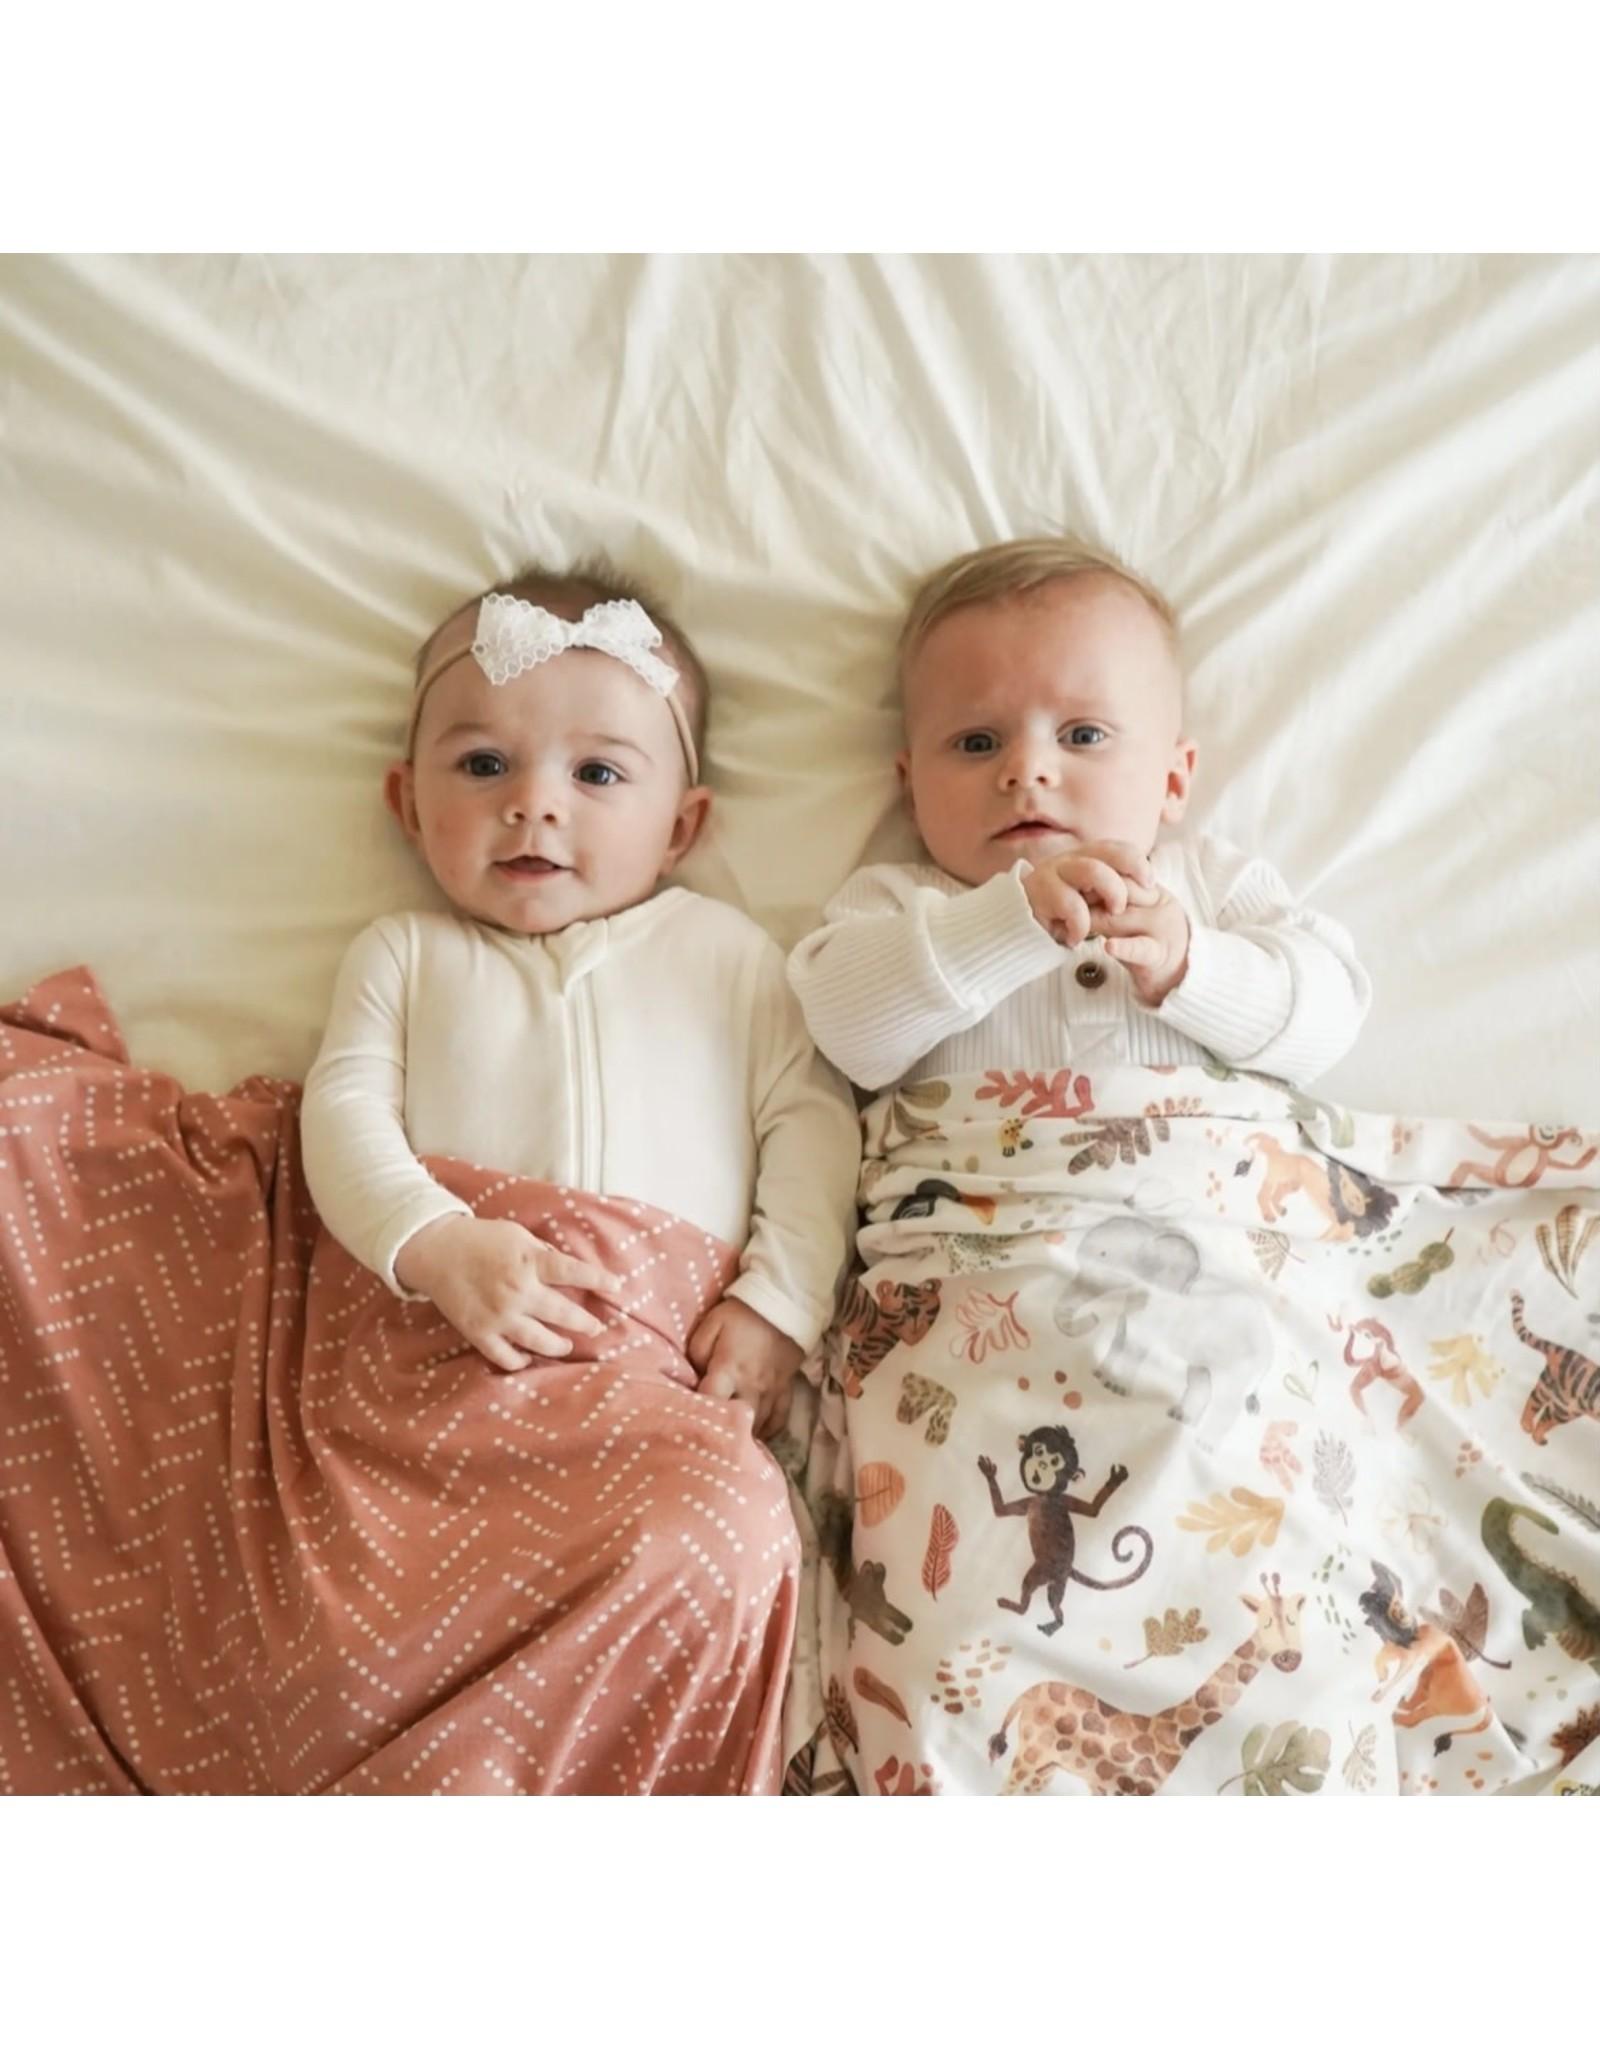 Village Baby Village Baby- Extra Soft Stretchy Knit Swaddle Blanket: Wild Safari